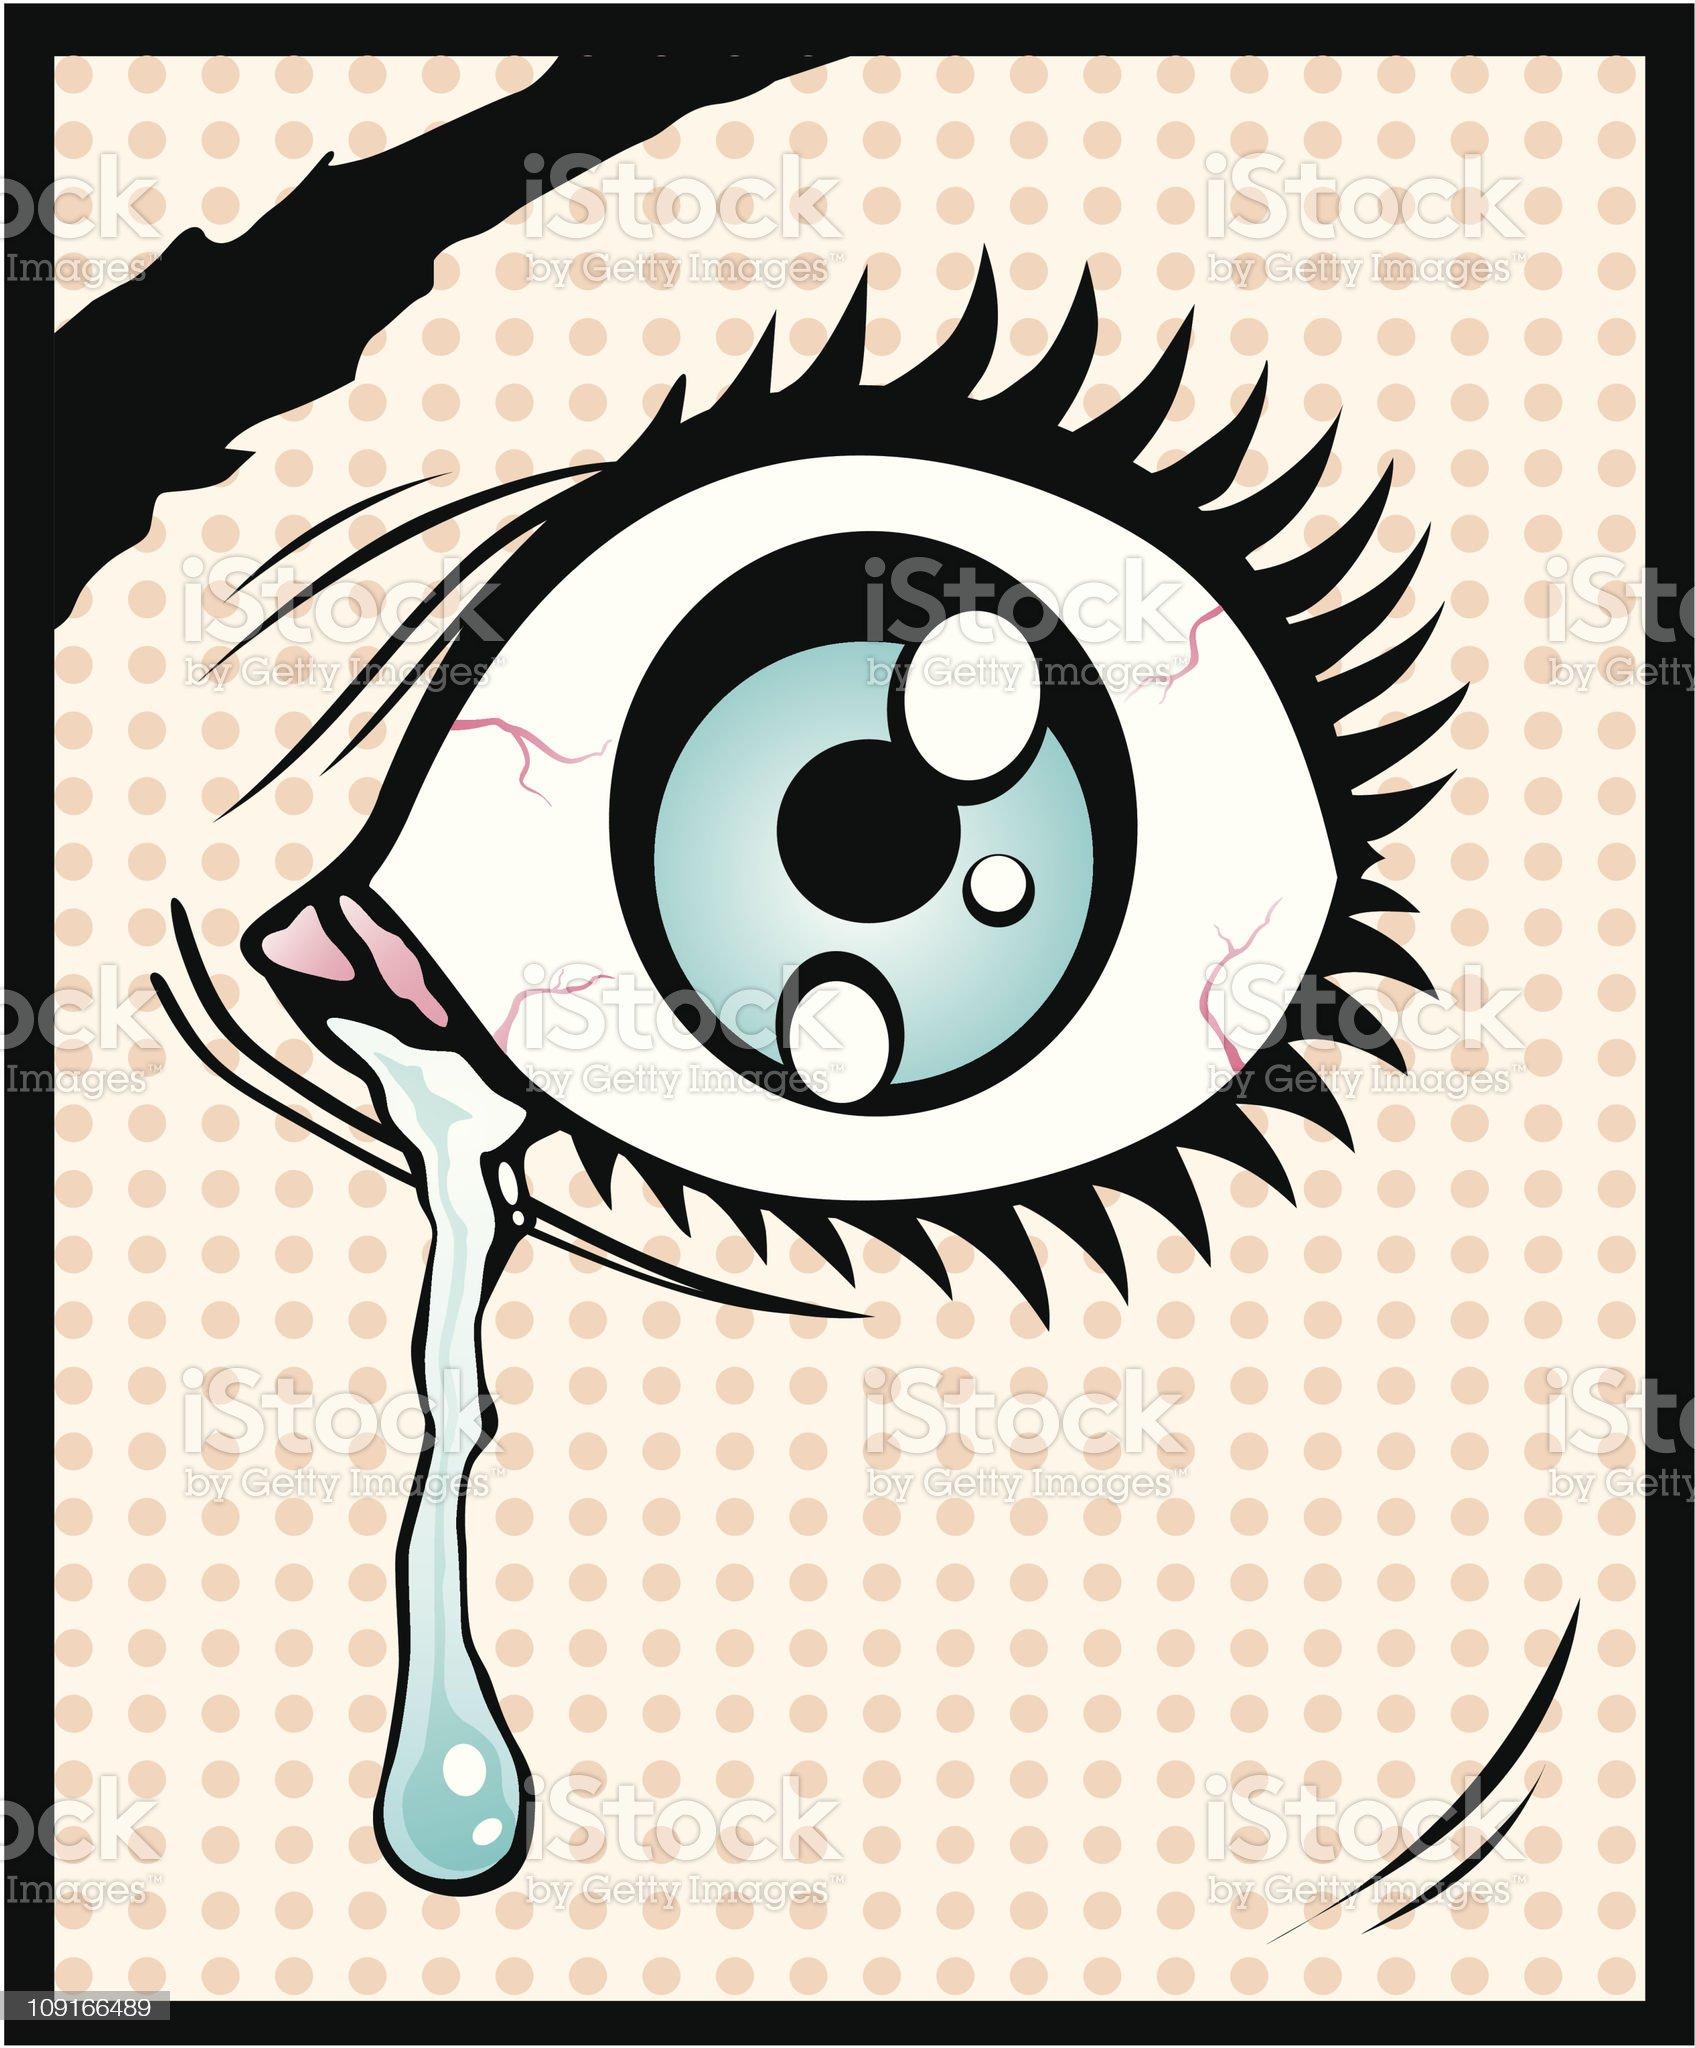 Vector illustration of the eye royalty-free stock vector art